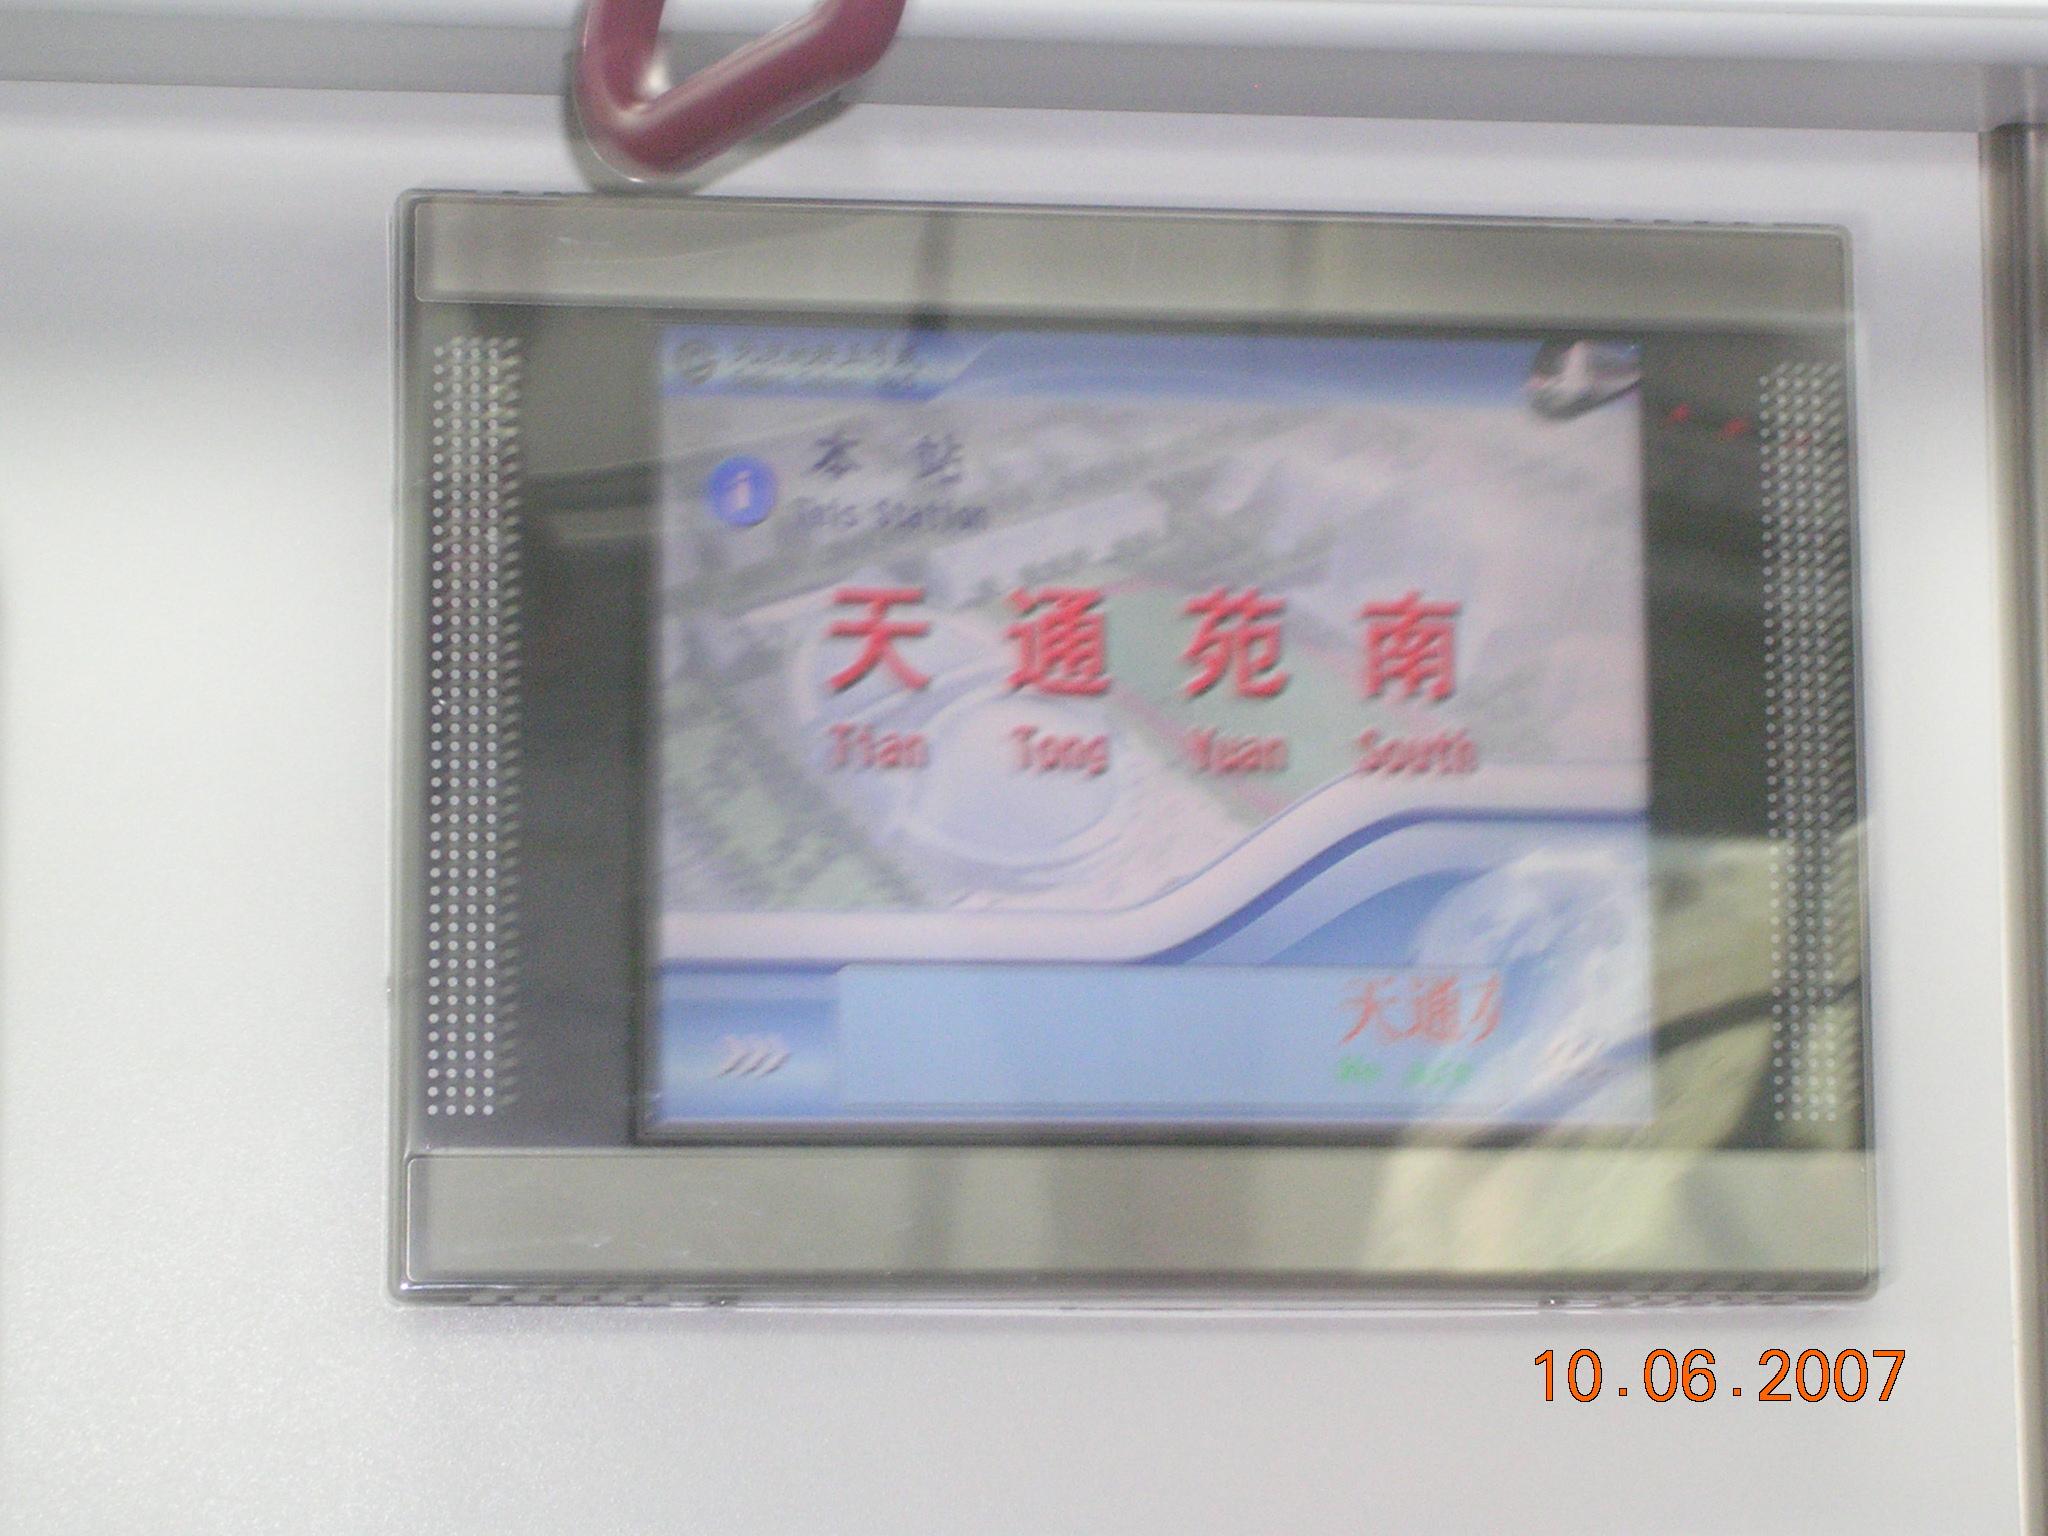 2007-10-07A 040.jpg